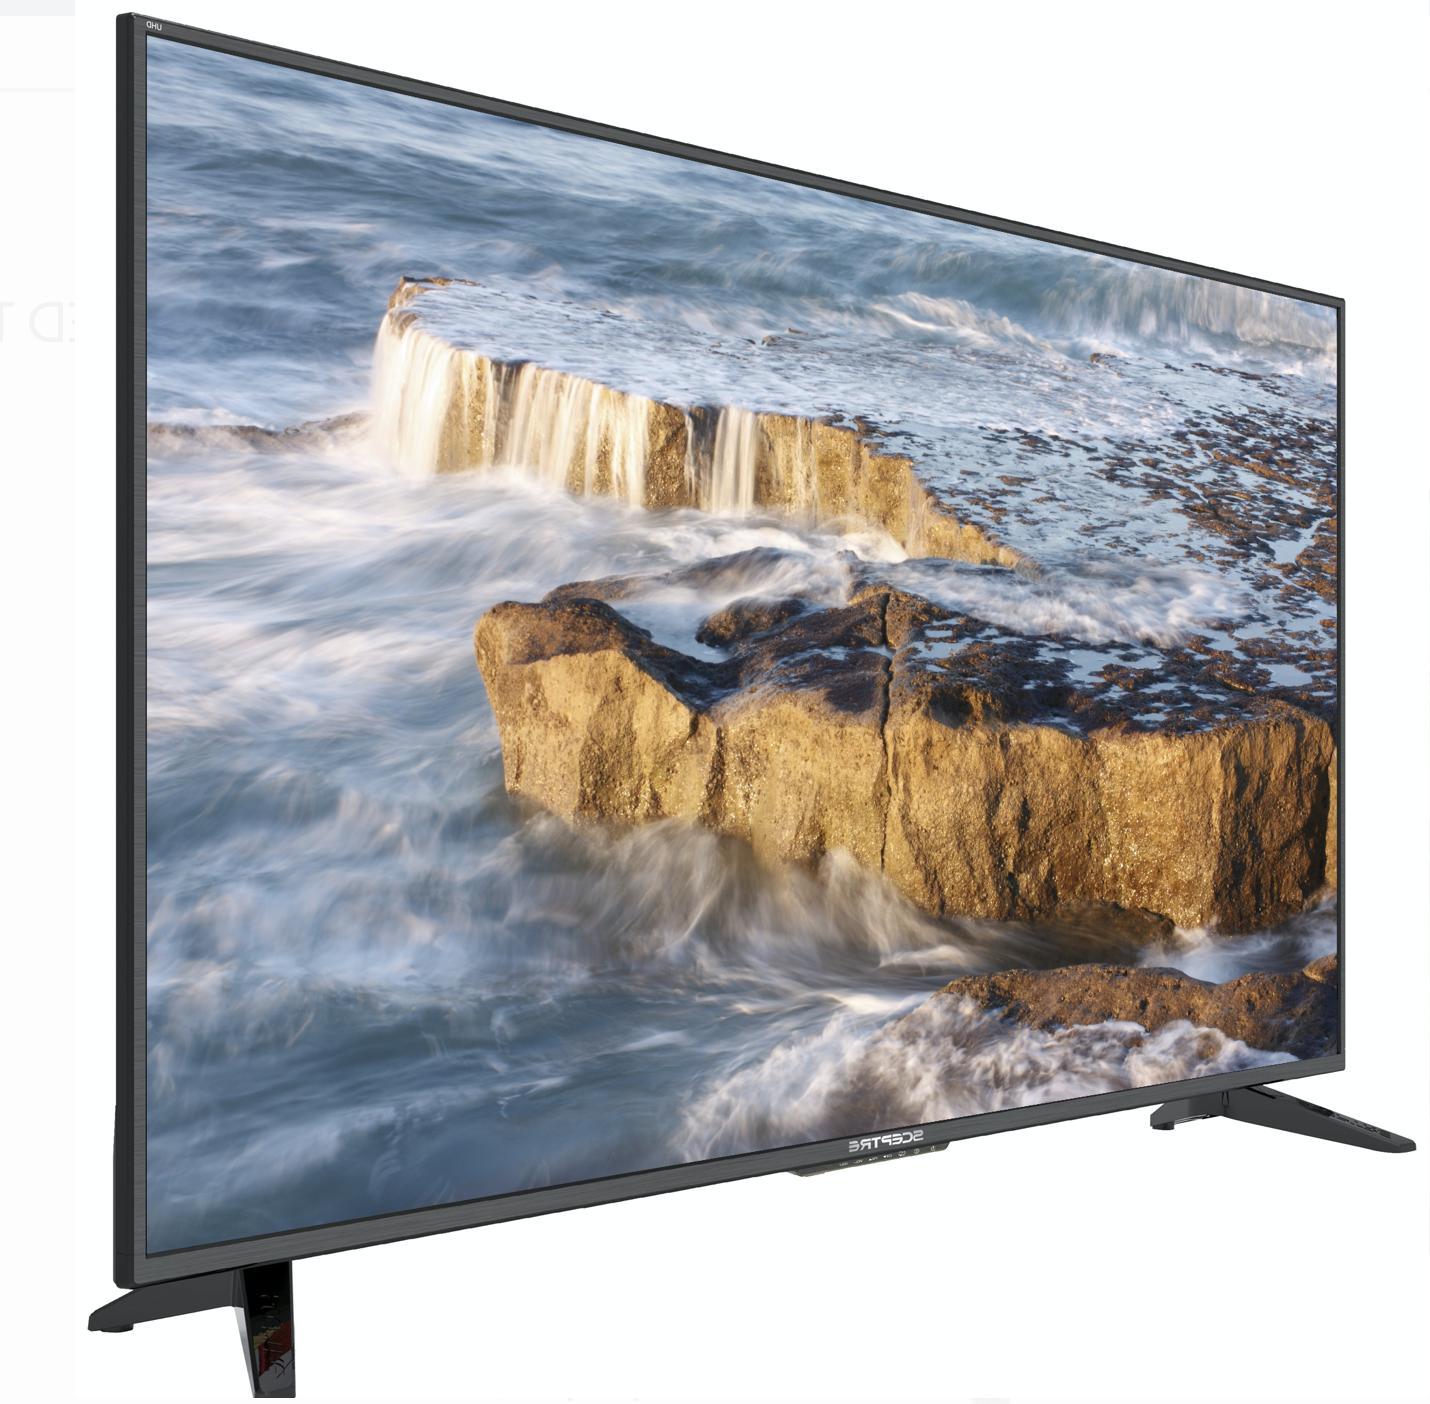 Sceptre 50inch UHD TV U515CV-U